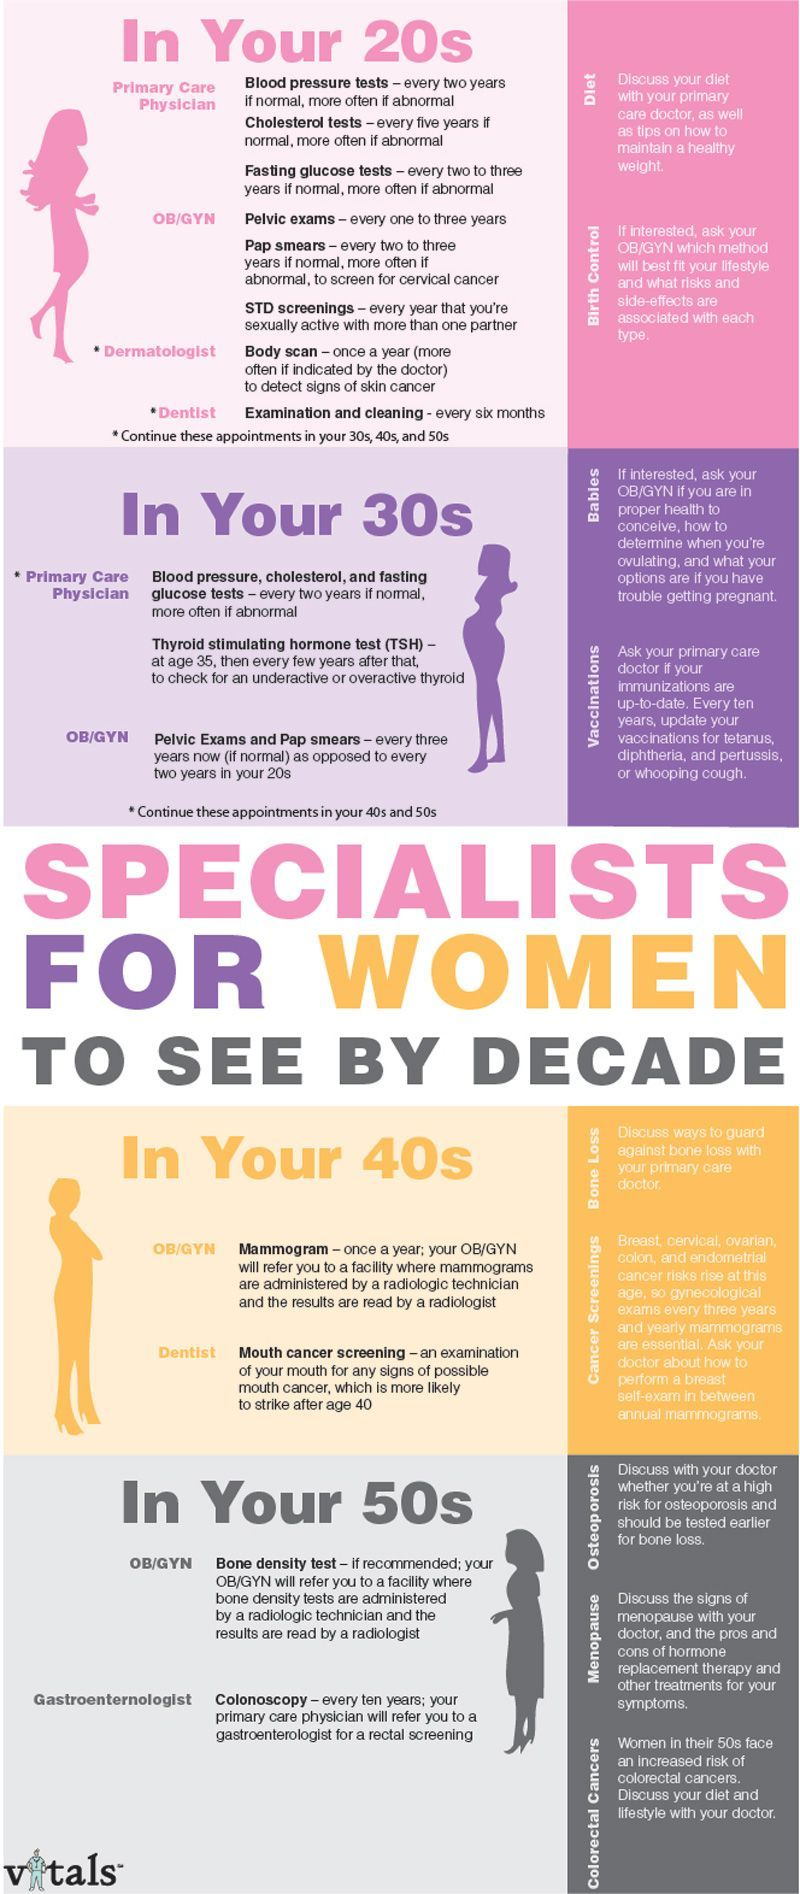 #demographic #specialists #womens #health #women #for #see #age #to #byWomen's Health: Specialists f...